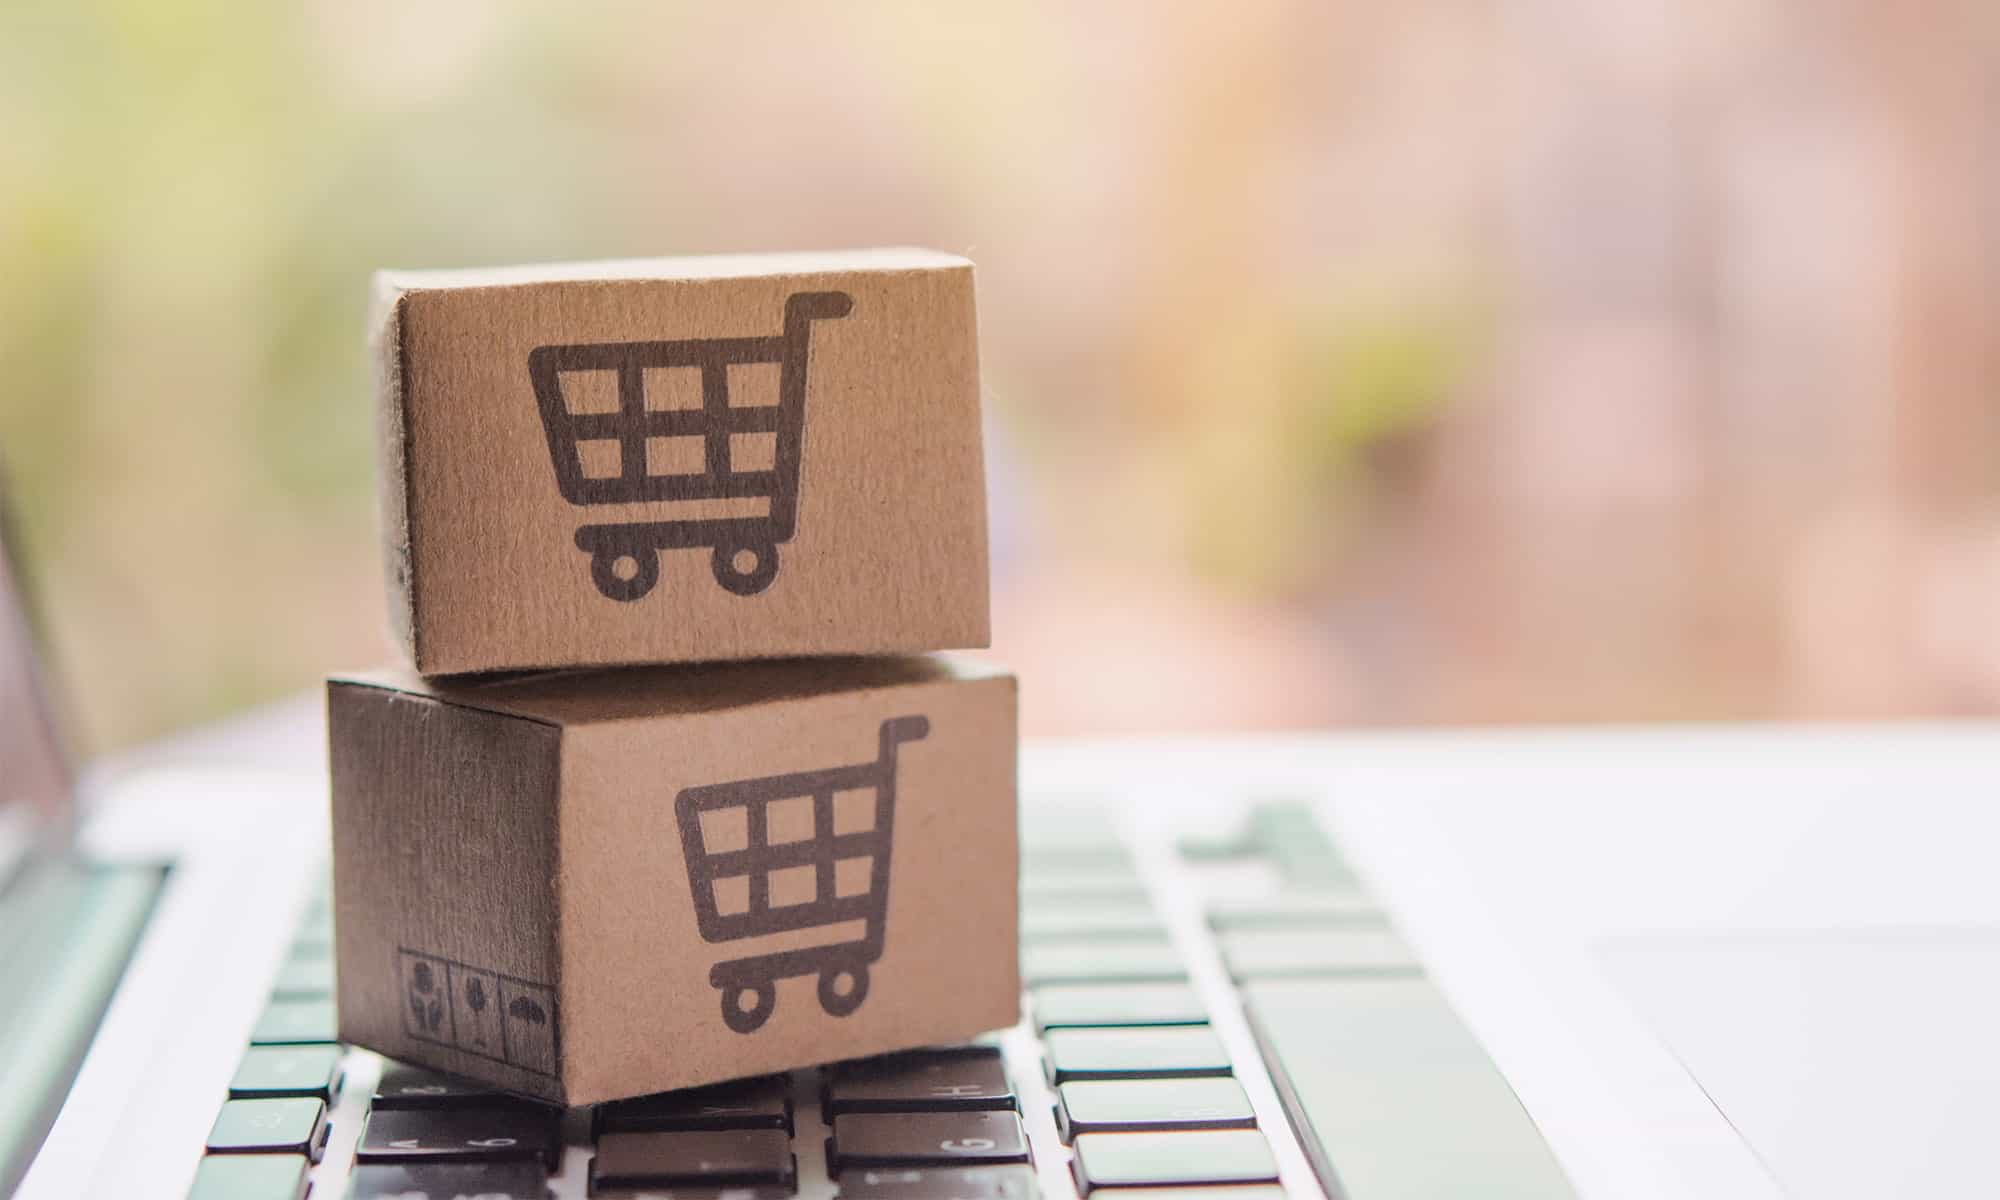 tiendas-online-digitaldot